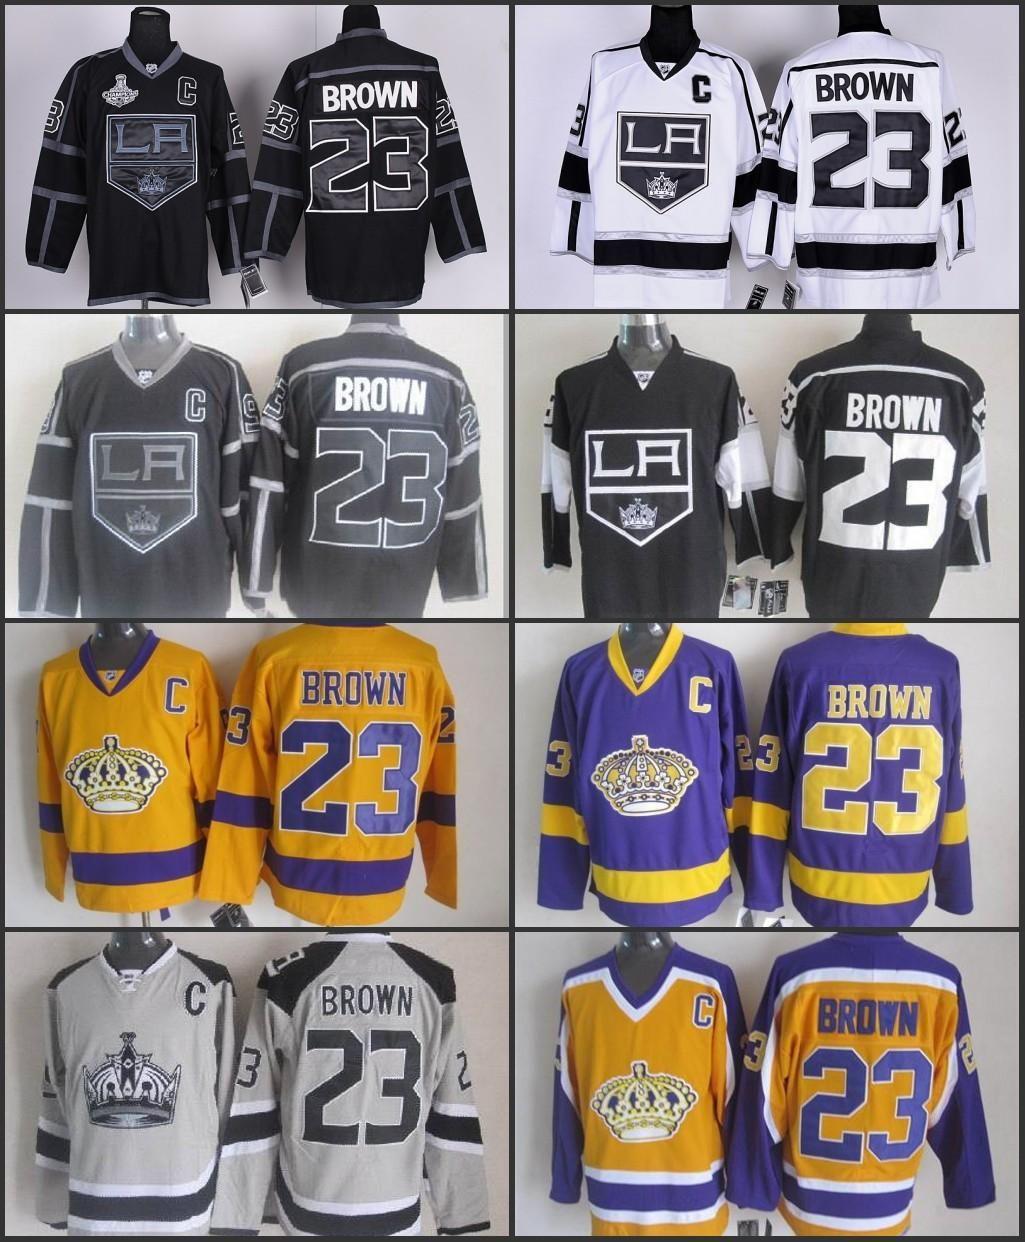 new style 484fc 56813 Dustin Brown Jersey 23 Cheap Los Angeles Kings jersey Brown men White Black  LA Kings Authentic Hockey Jerseys